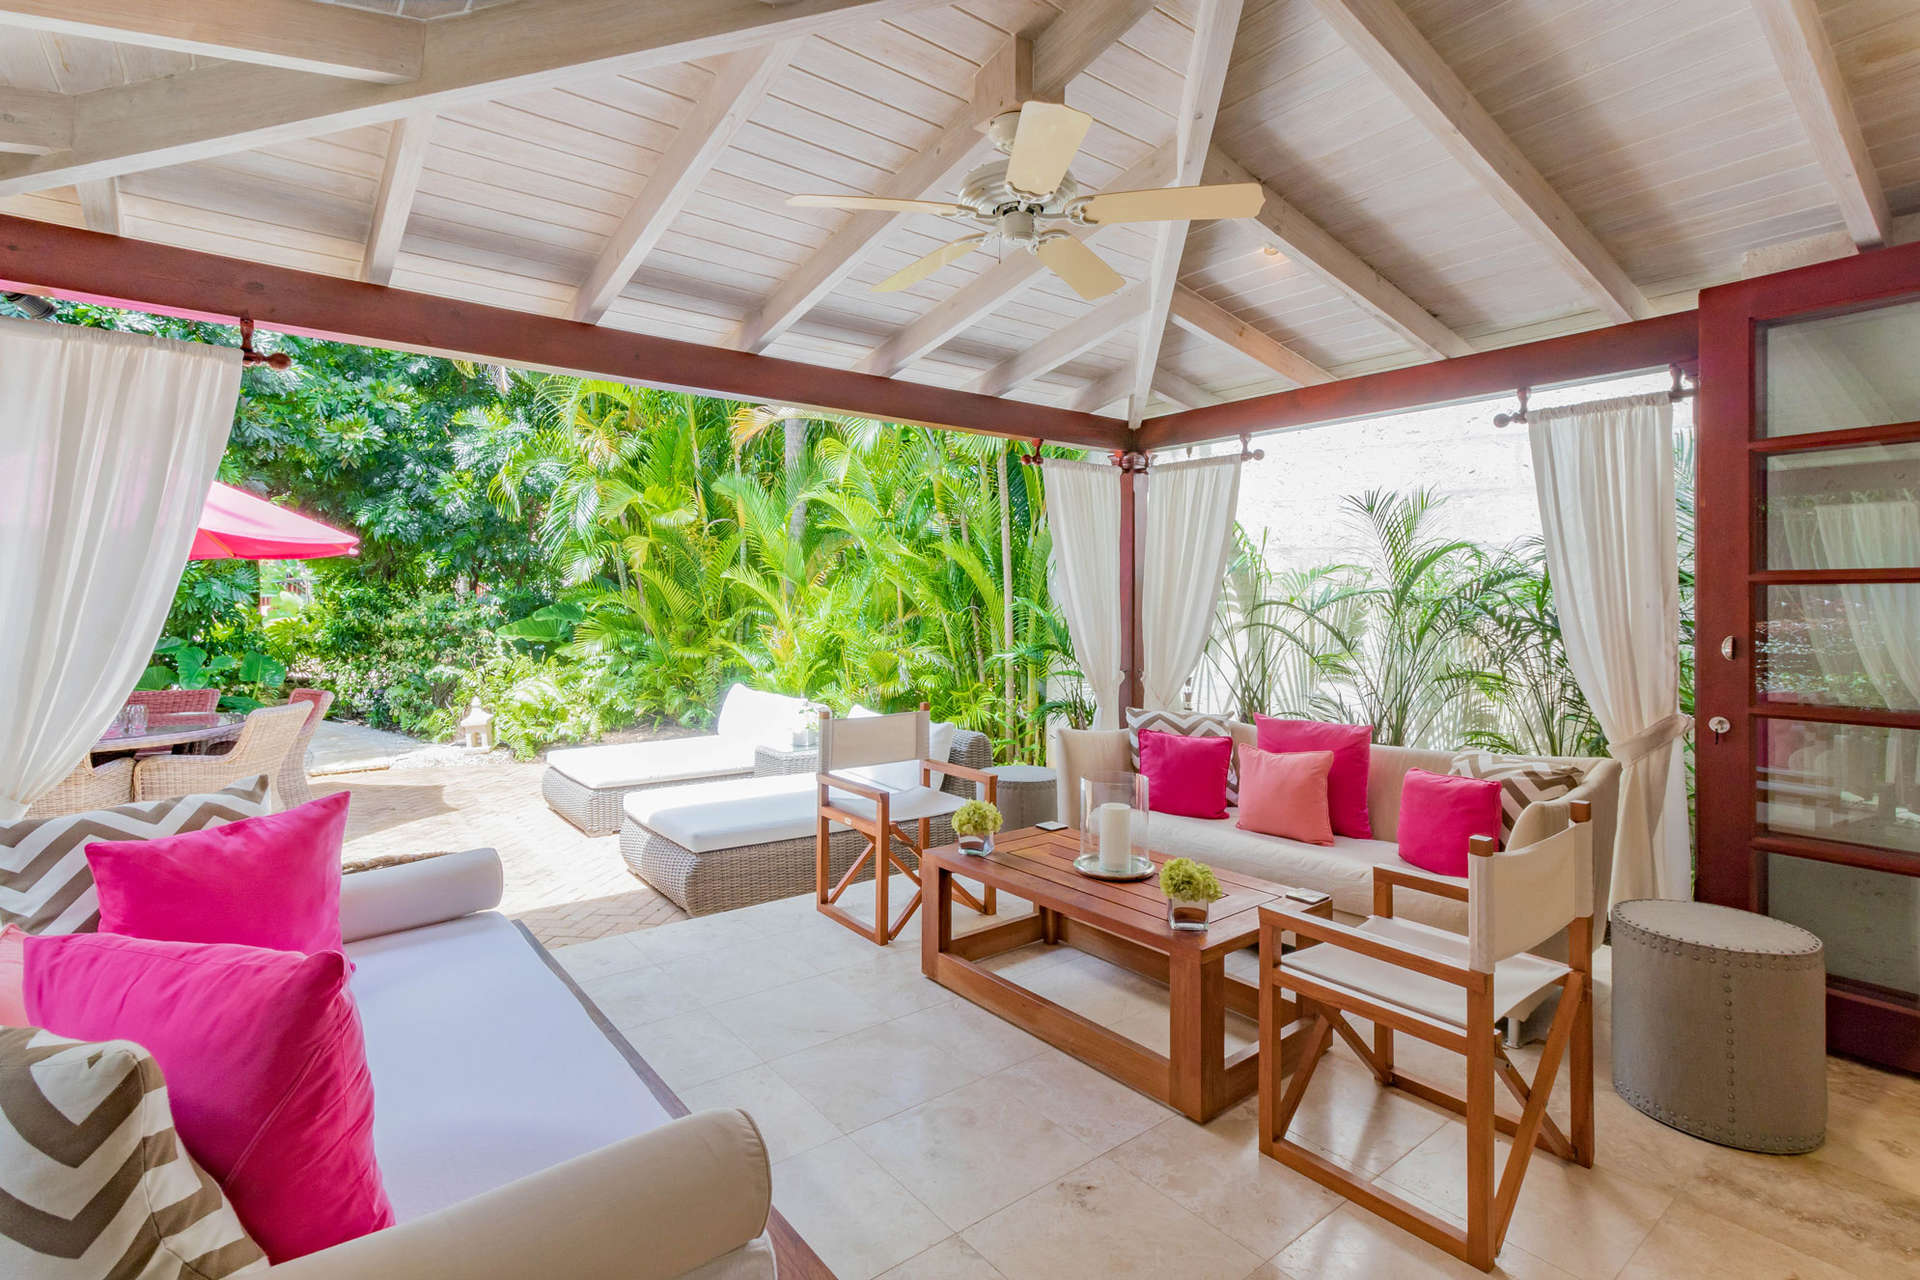 Luxury villa rentals caribbean - Barbados - St peter - Gibbes - Claridges 6 - Image 1/13